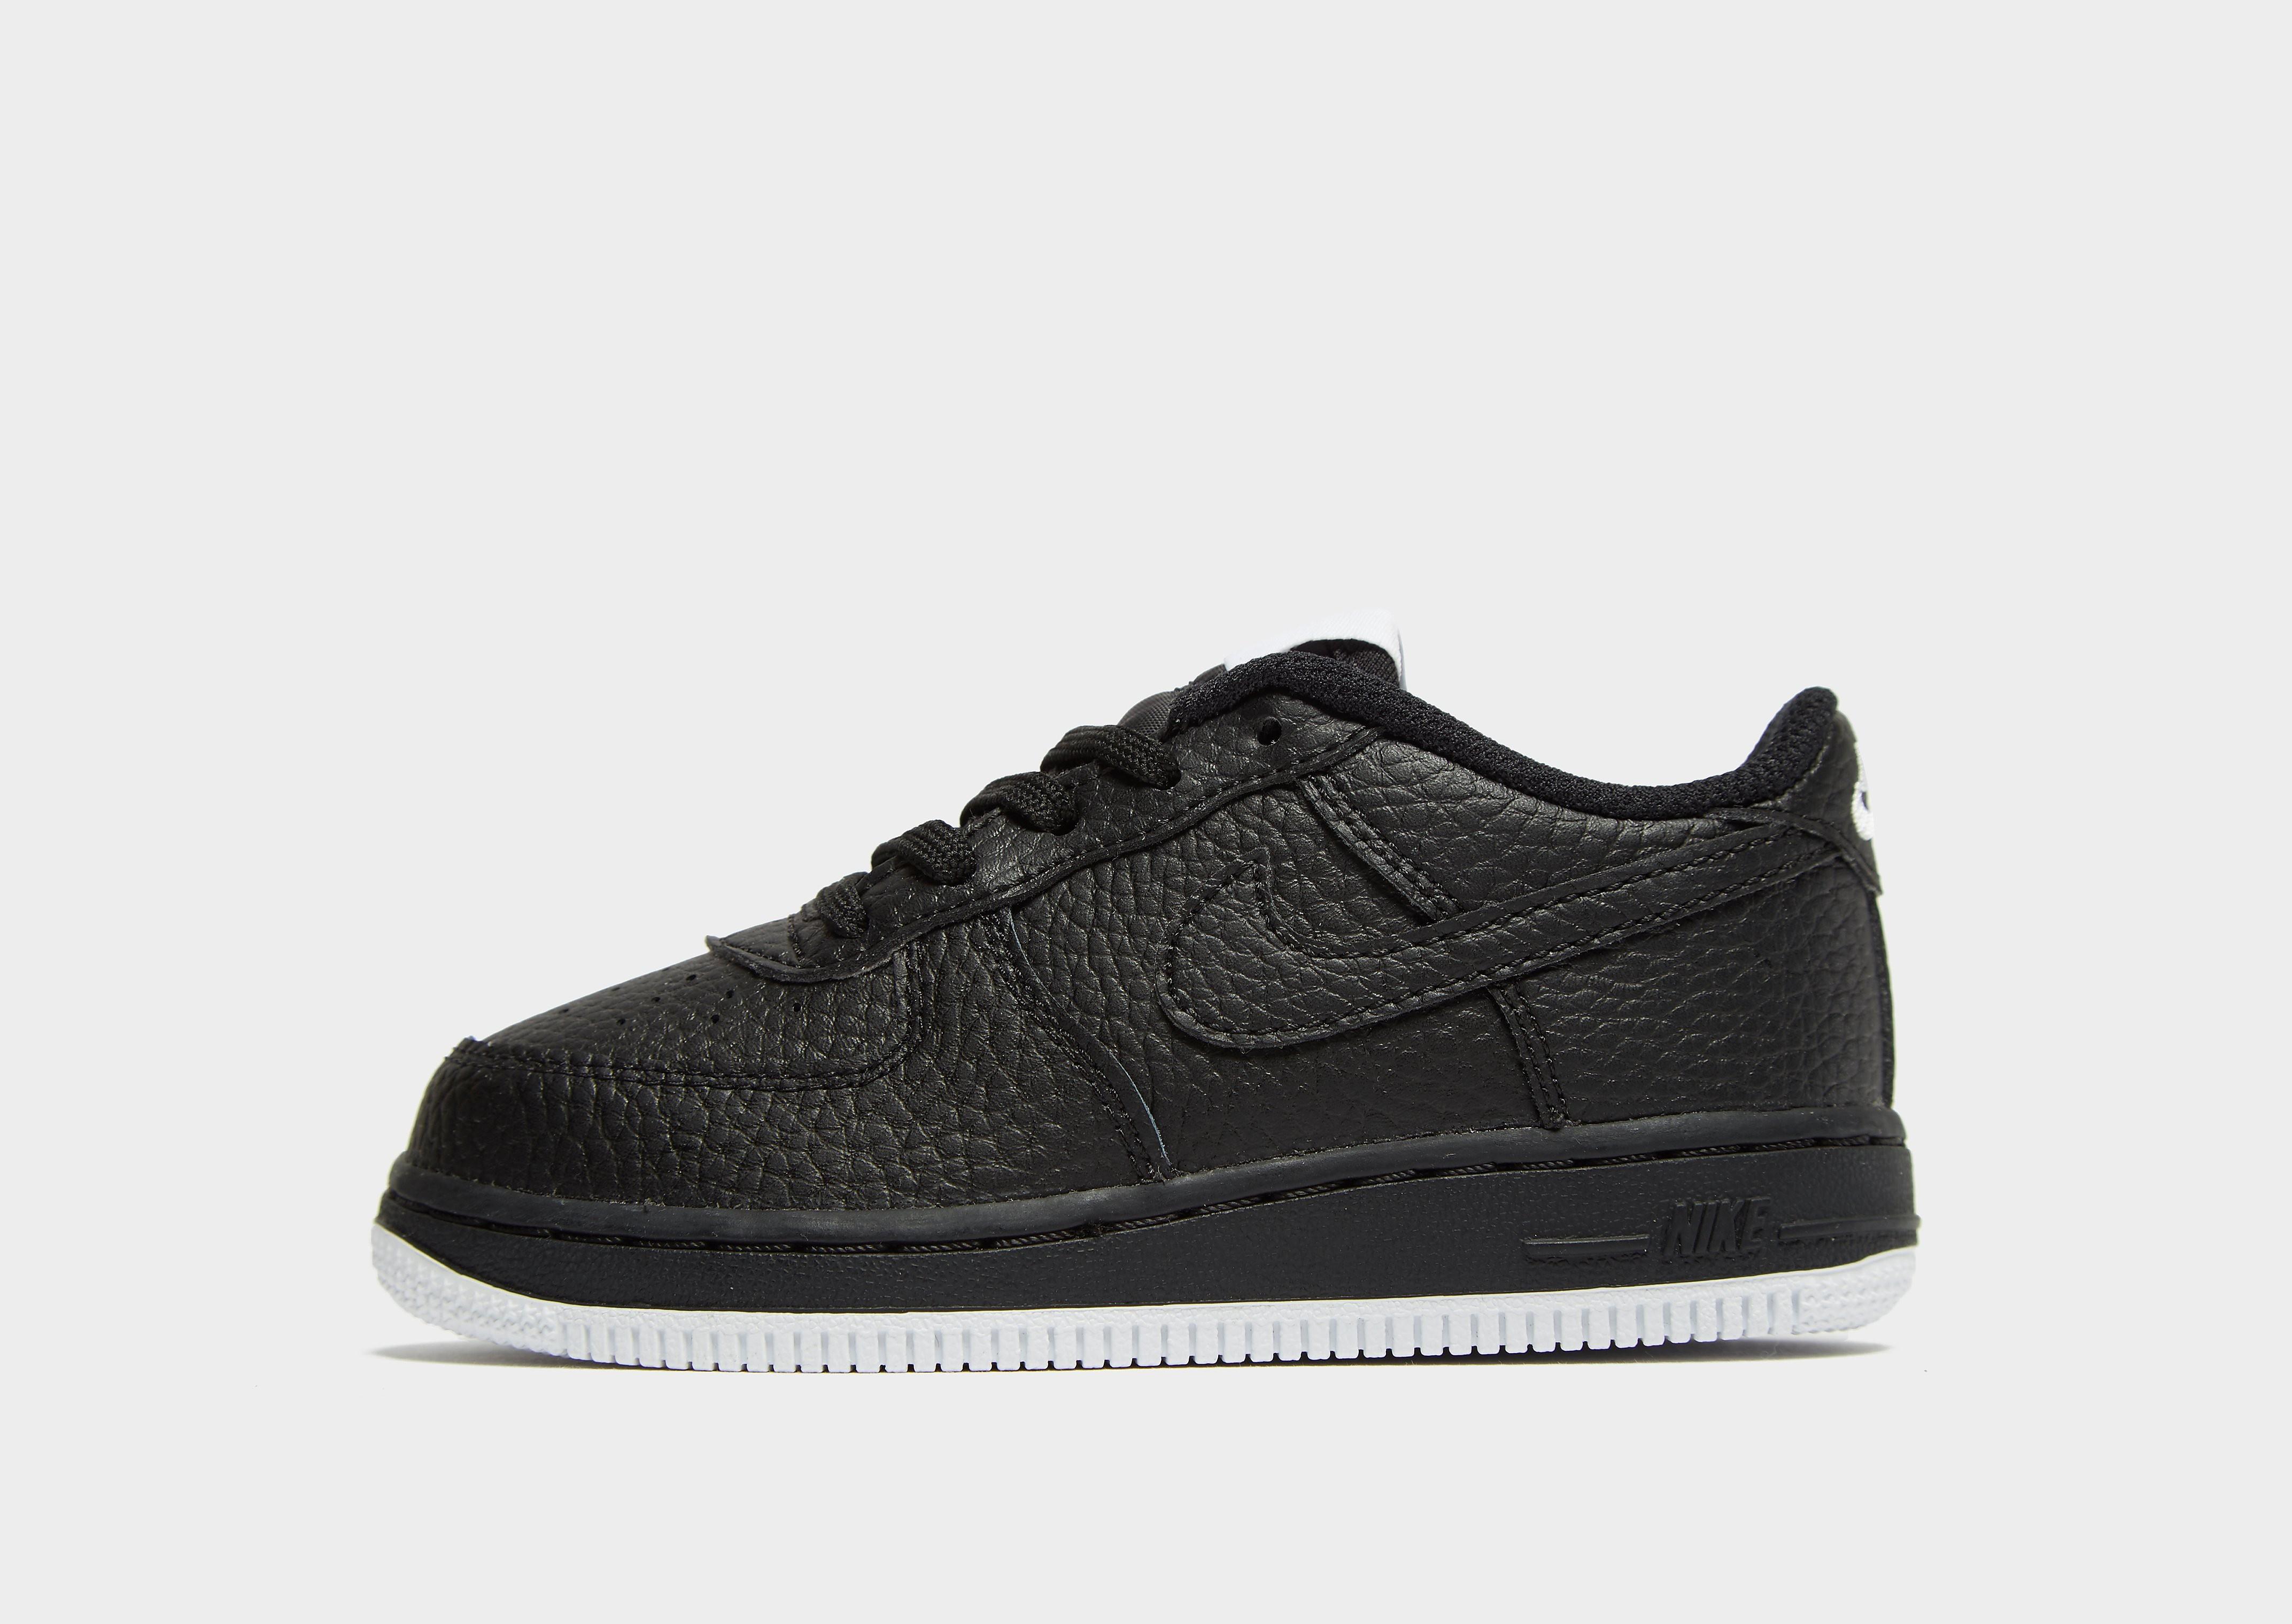 721bdd0adeb Nike baby sneakers kopen? | +50 modellen Baby Nikes - theSneaker.nl